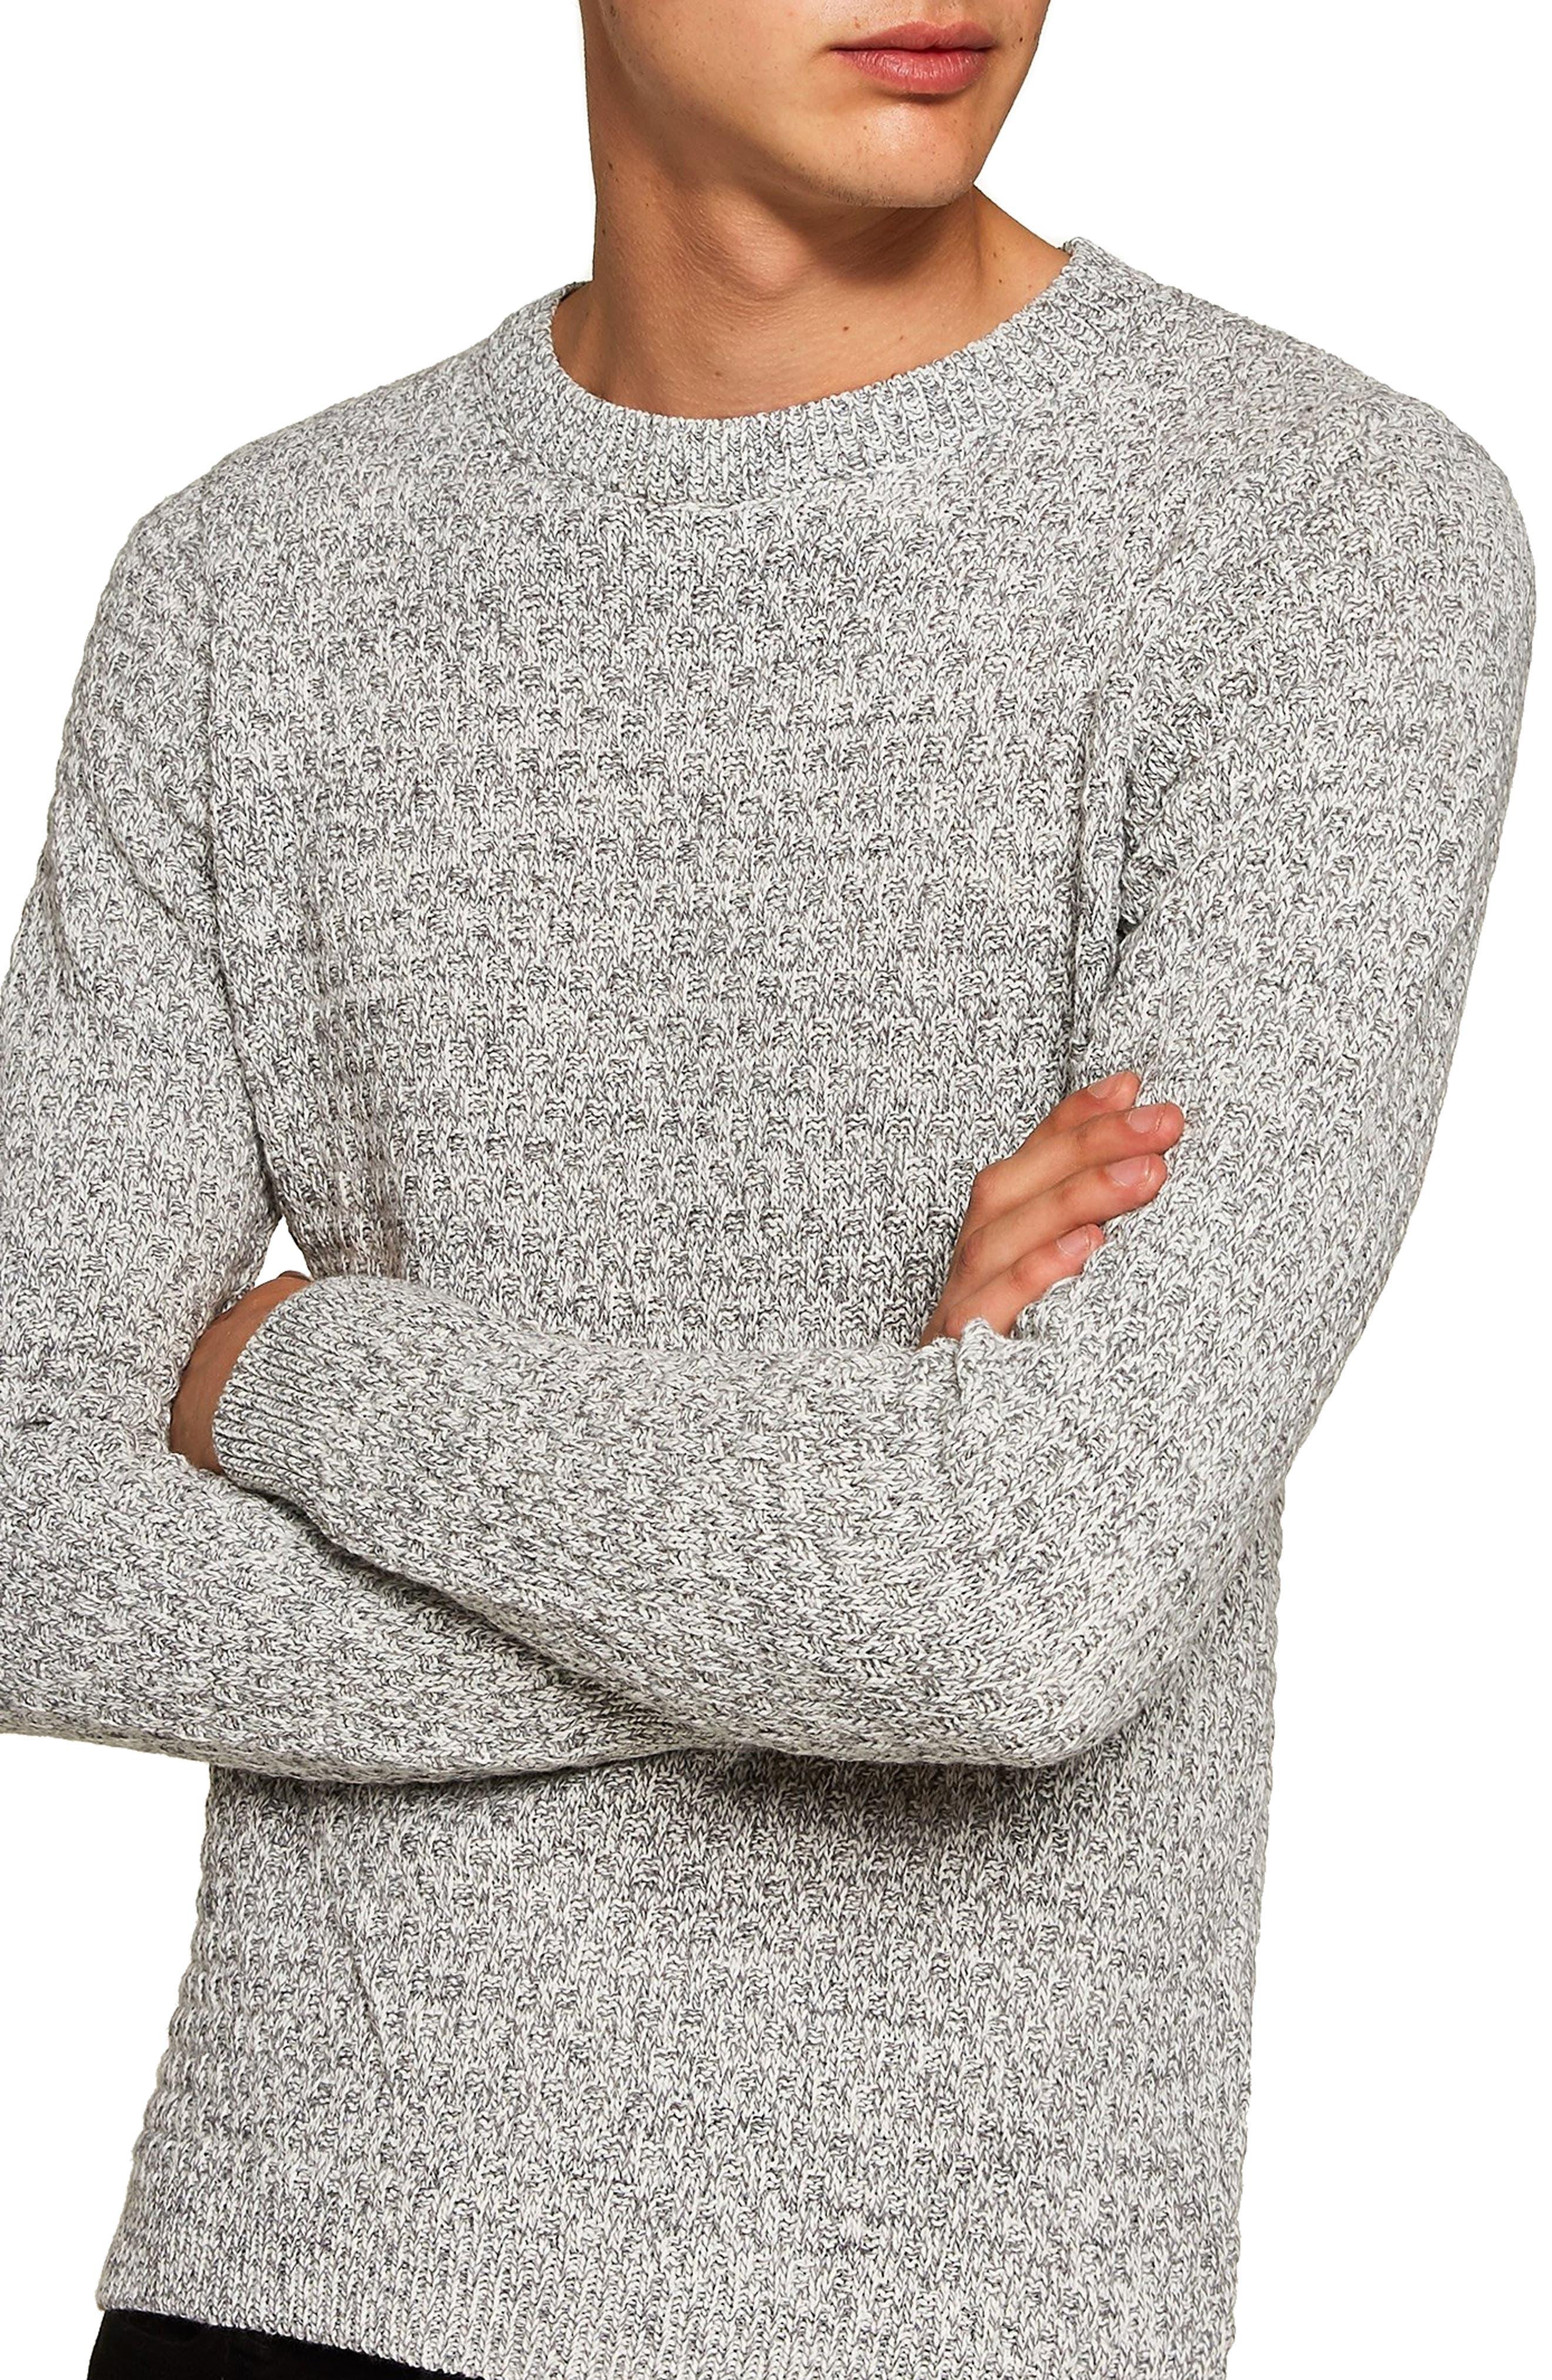 Textured Crewneck Sweater,                         Main,                         color, 020